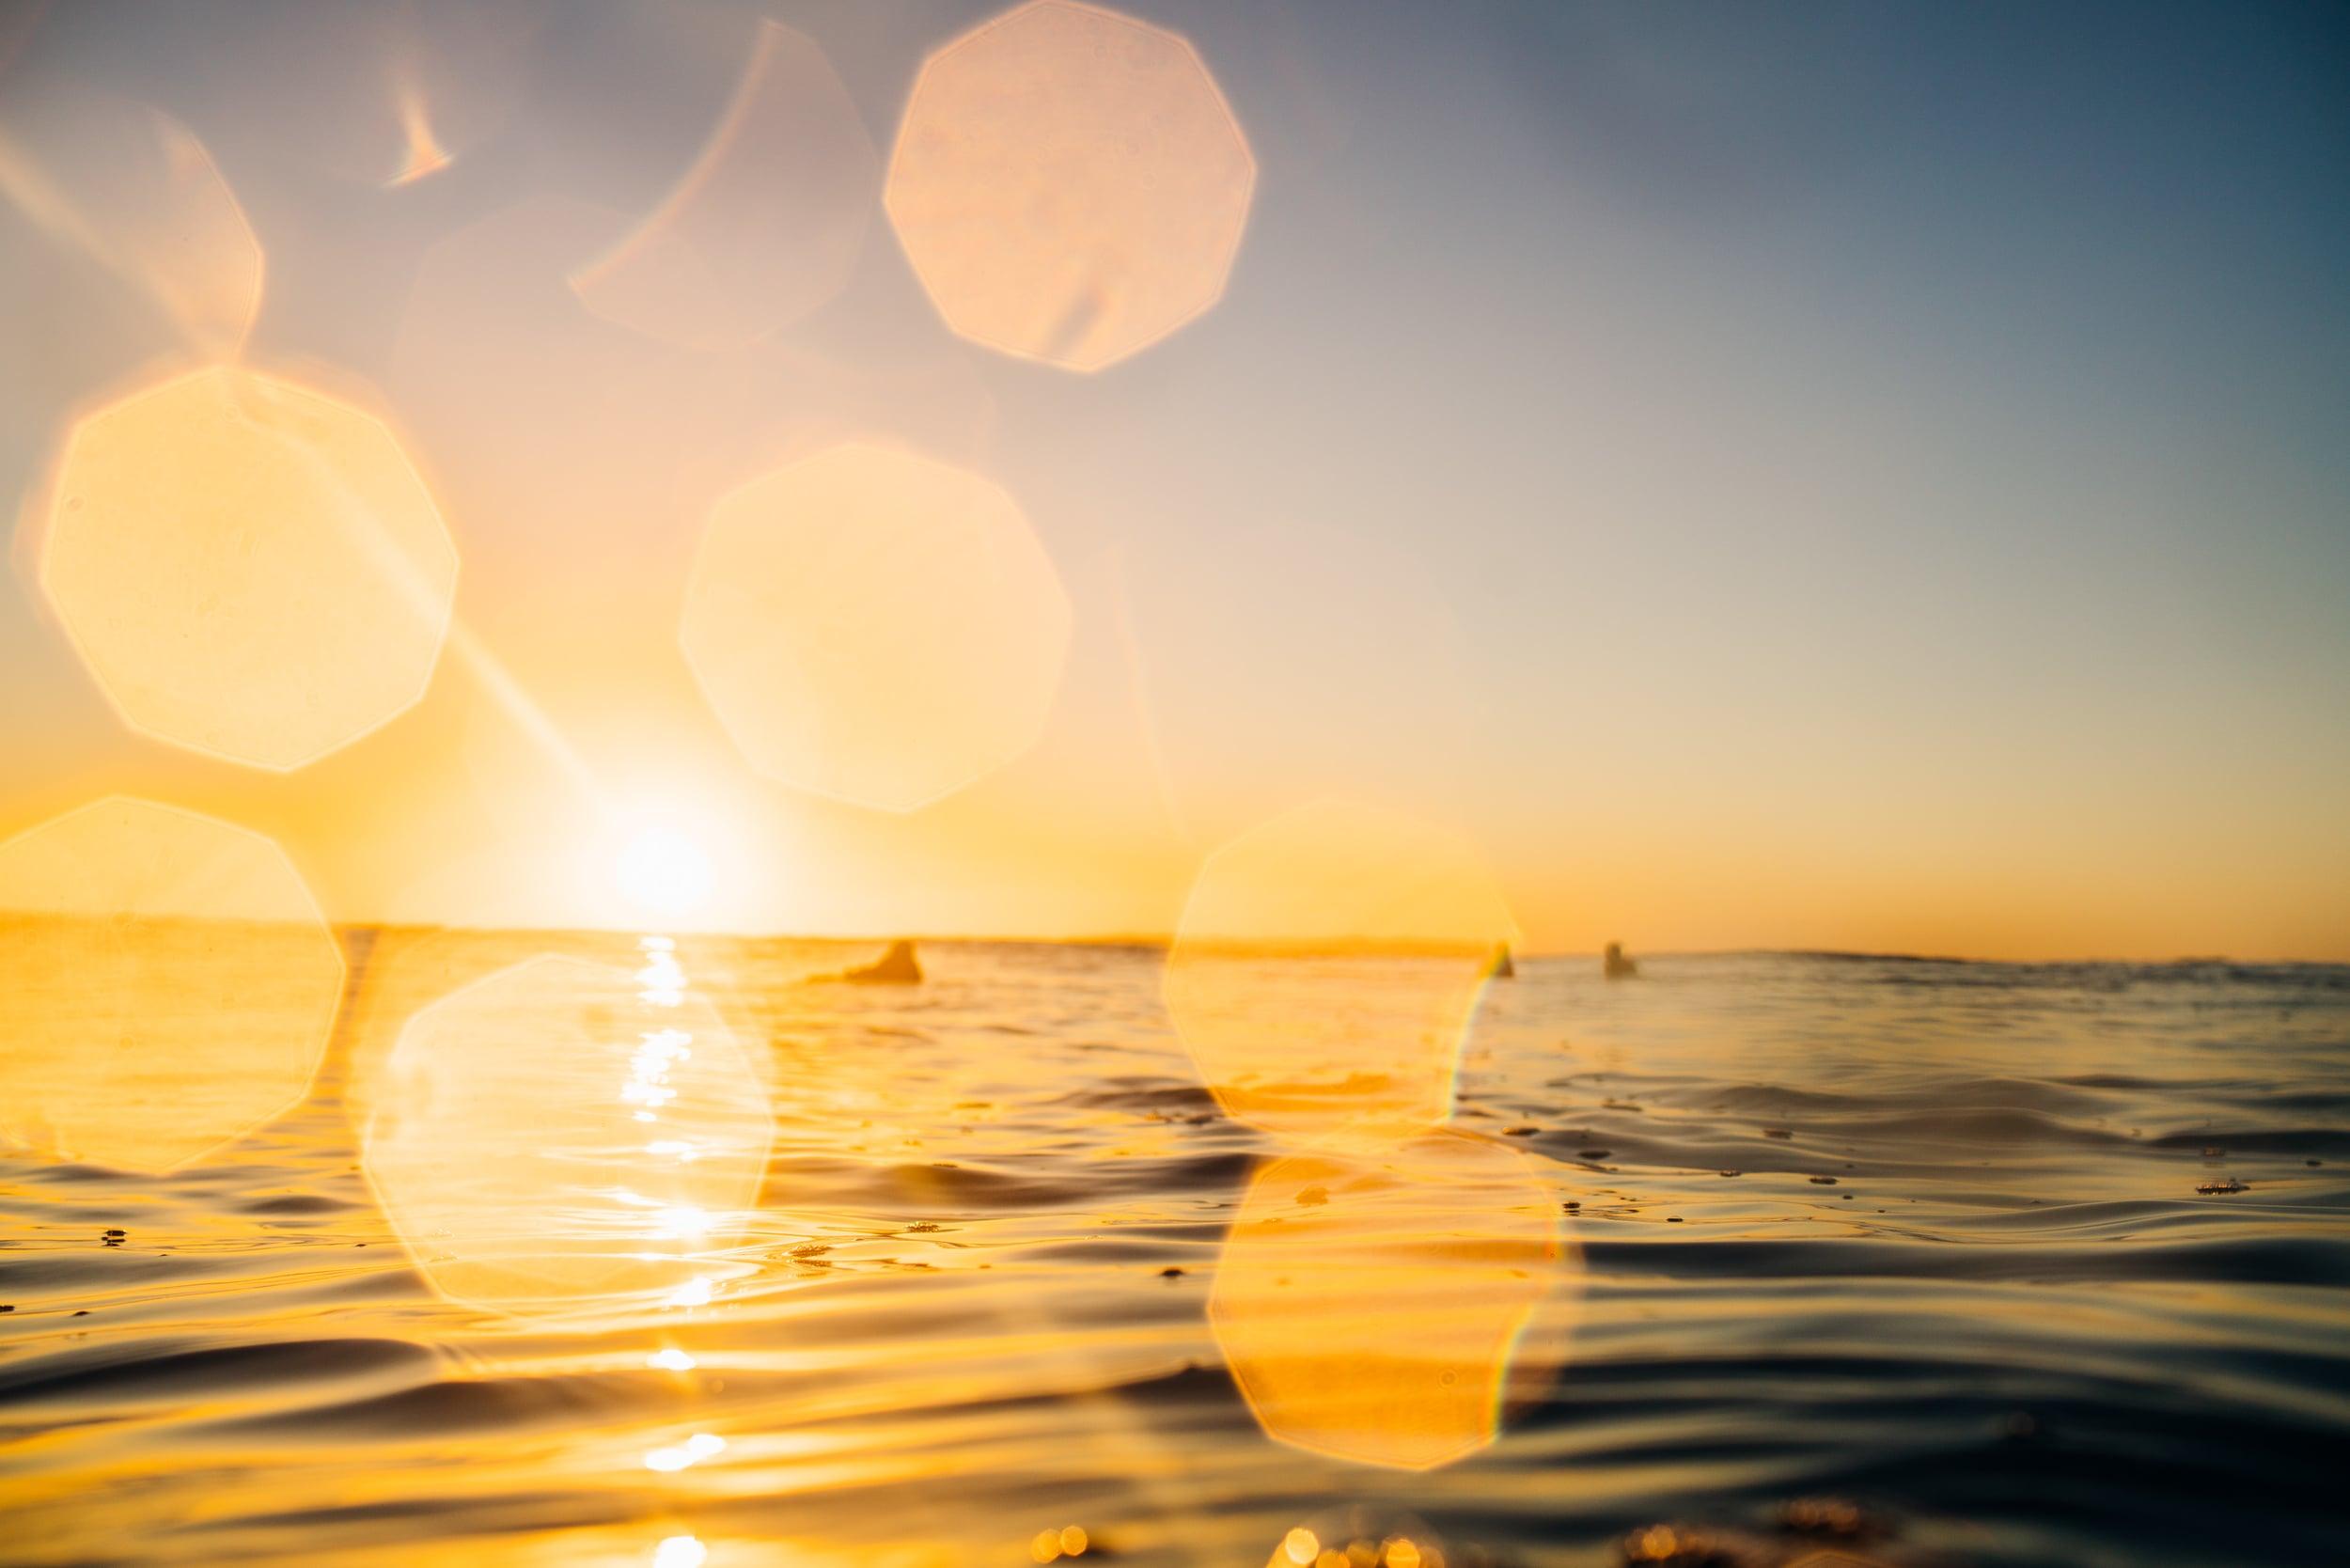 bryce-johnson-photography-kauai-hawaii-surfing-a7rii-aquatech-water-ocean-8.jpg